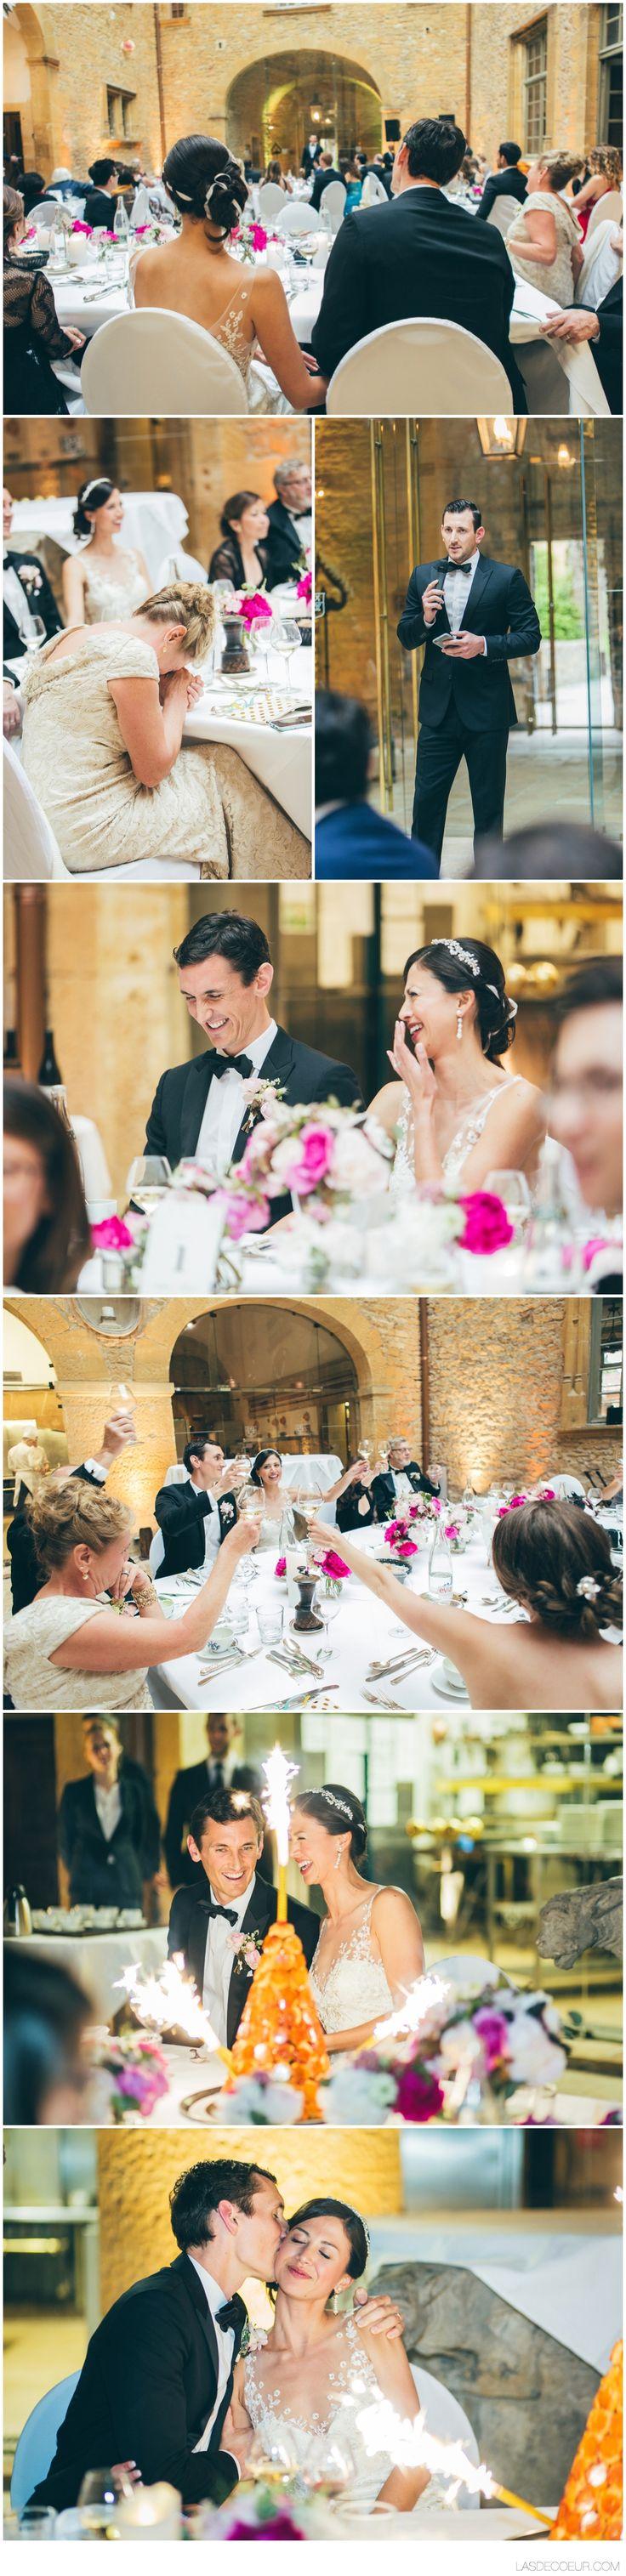 discours mariage photo cinma soire mariage mariage chateau www lasdecoeur lasdecoeur com com photo - Discours De Remerciement Mariage